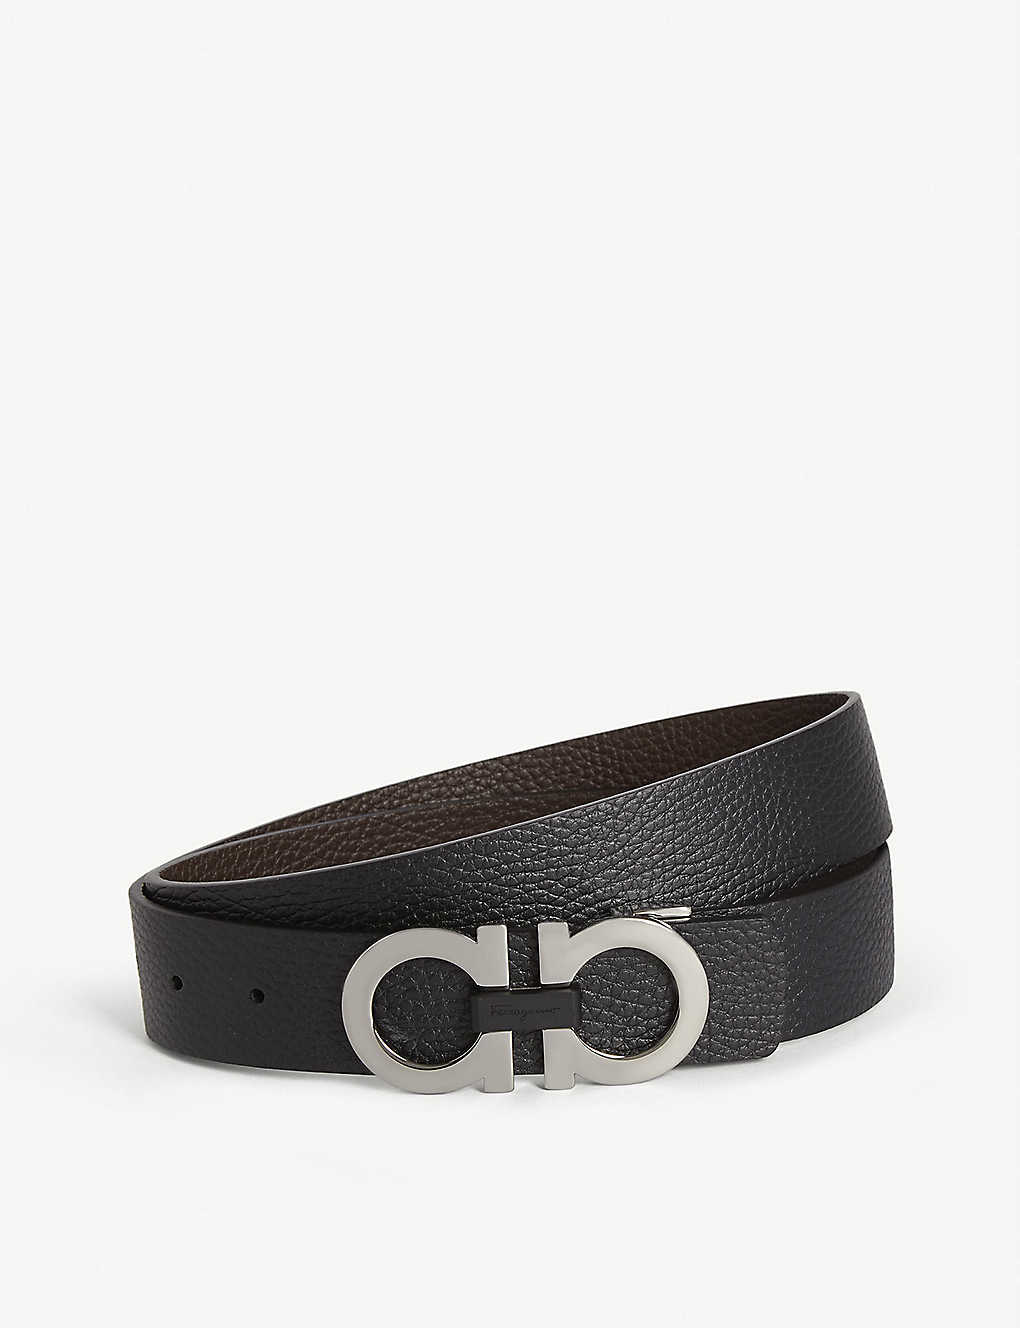 2be102211 SALVATORE FERRAGAMO - Gancini reversible leather belt | Selfridges.com